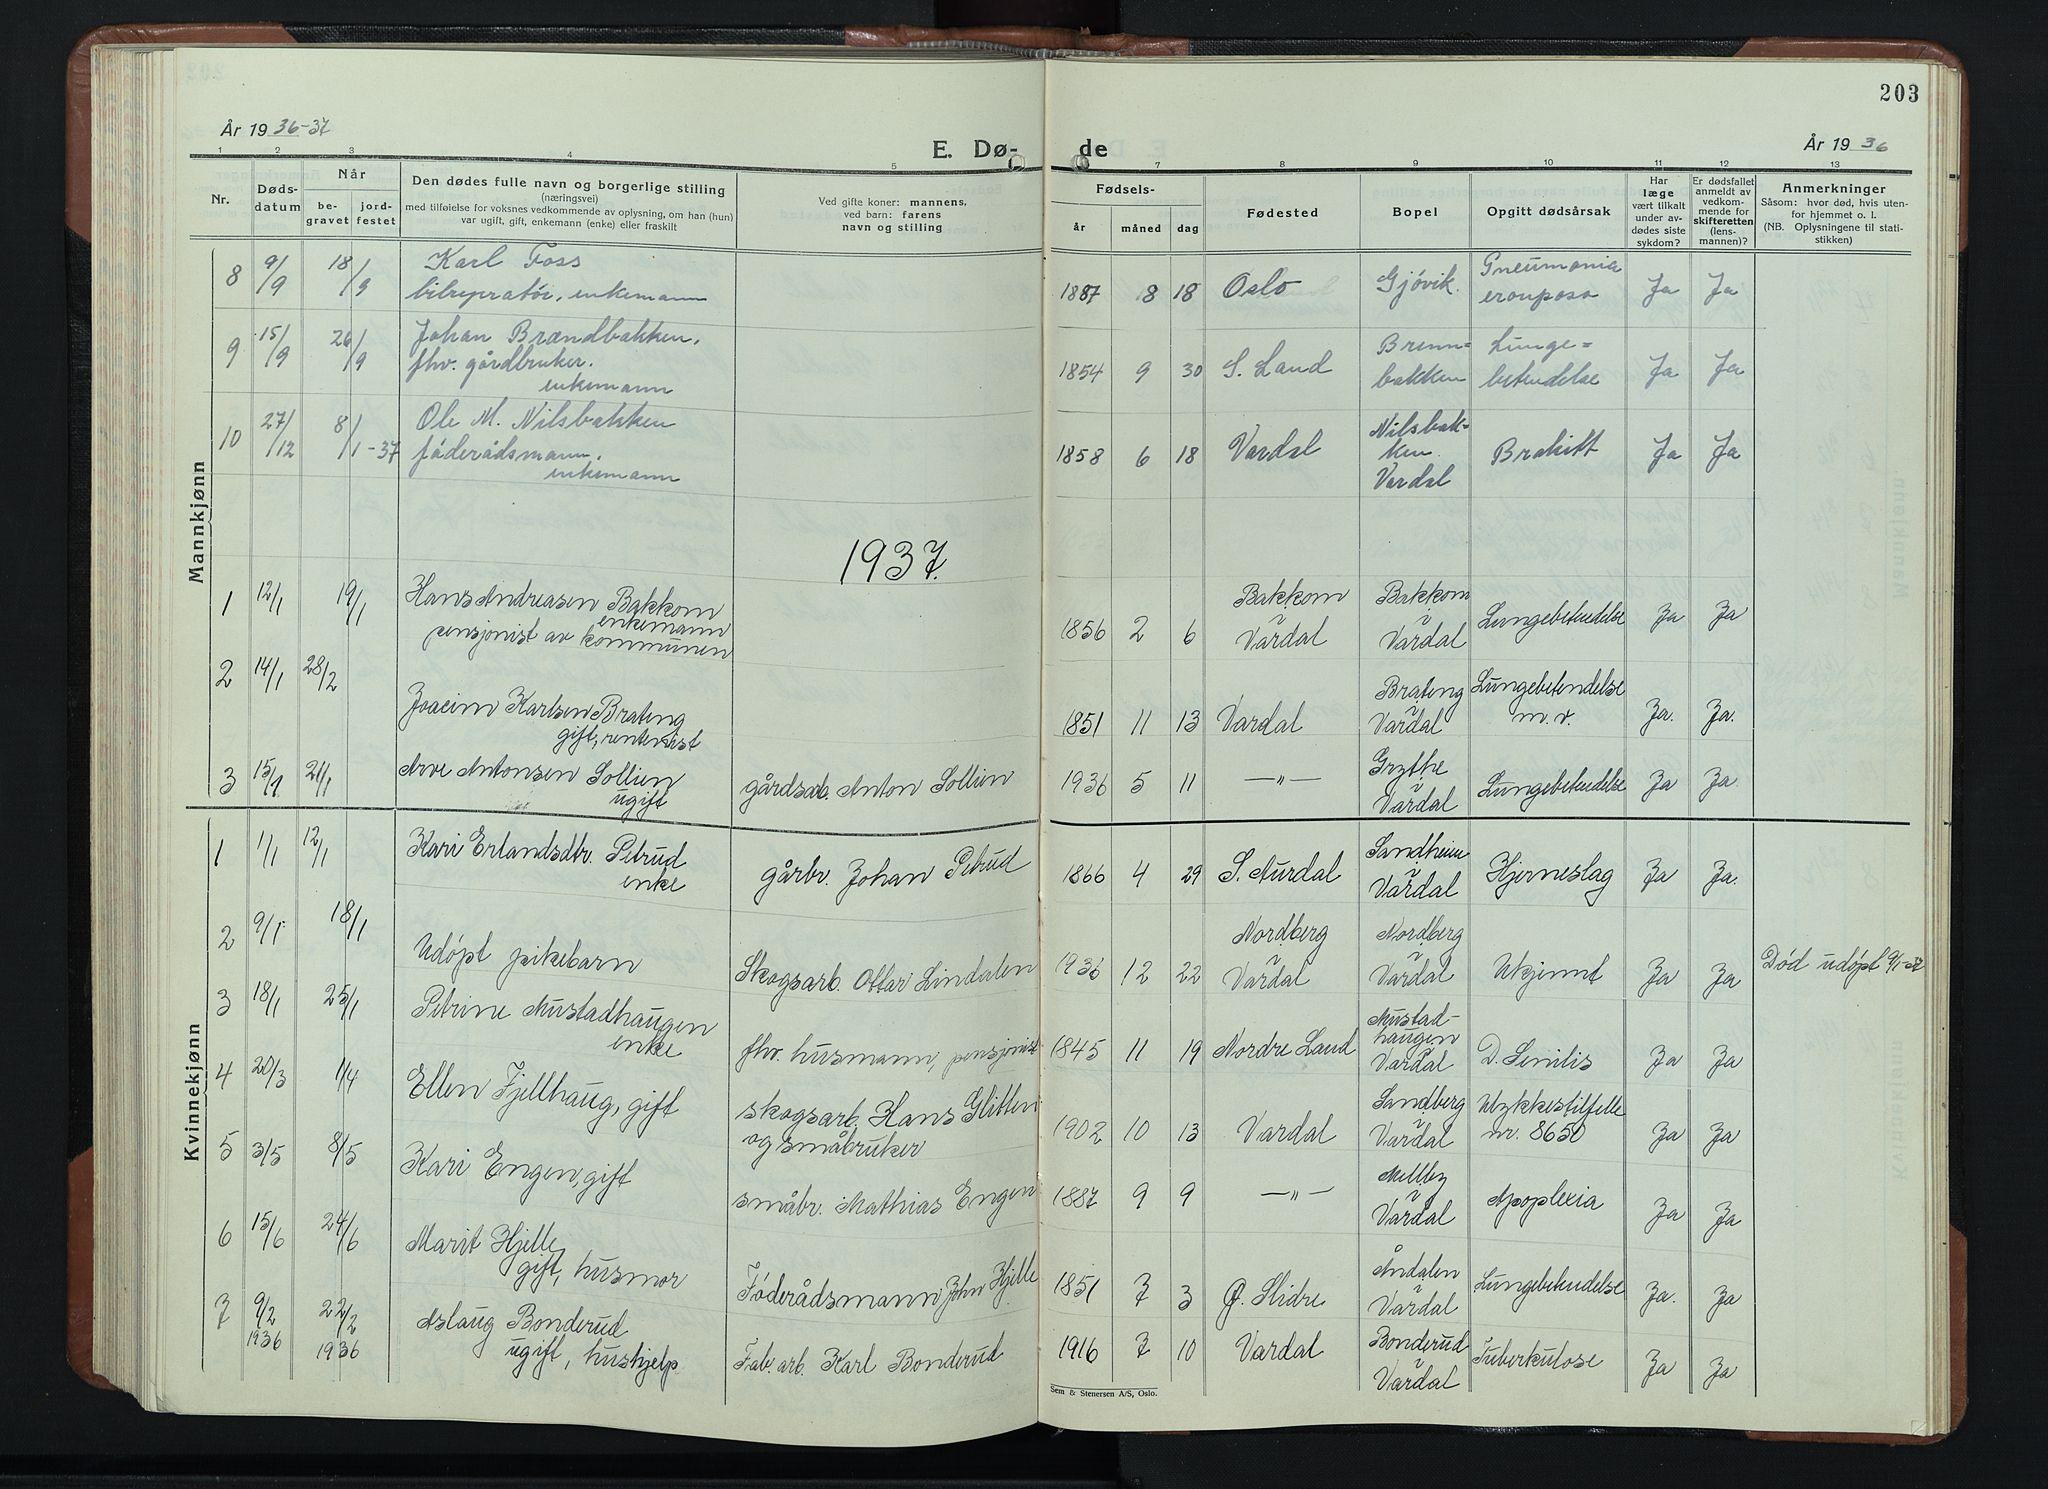 SAH, Vardal prestekontor, H/Ha/Hab/L0018: Klokkerbok nr. 18, 1931-1951, s. 203